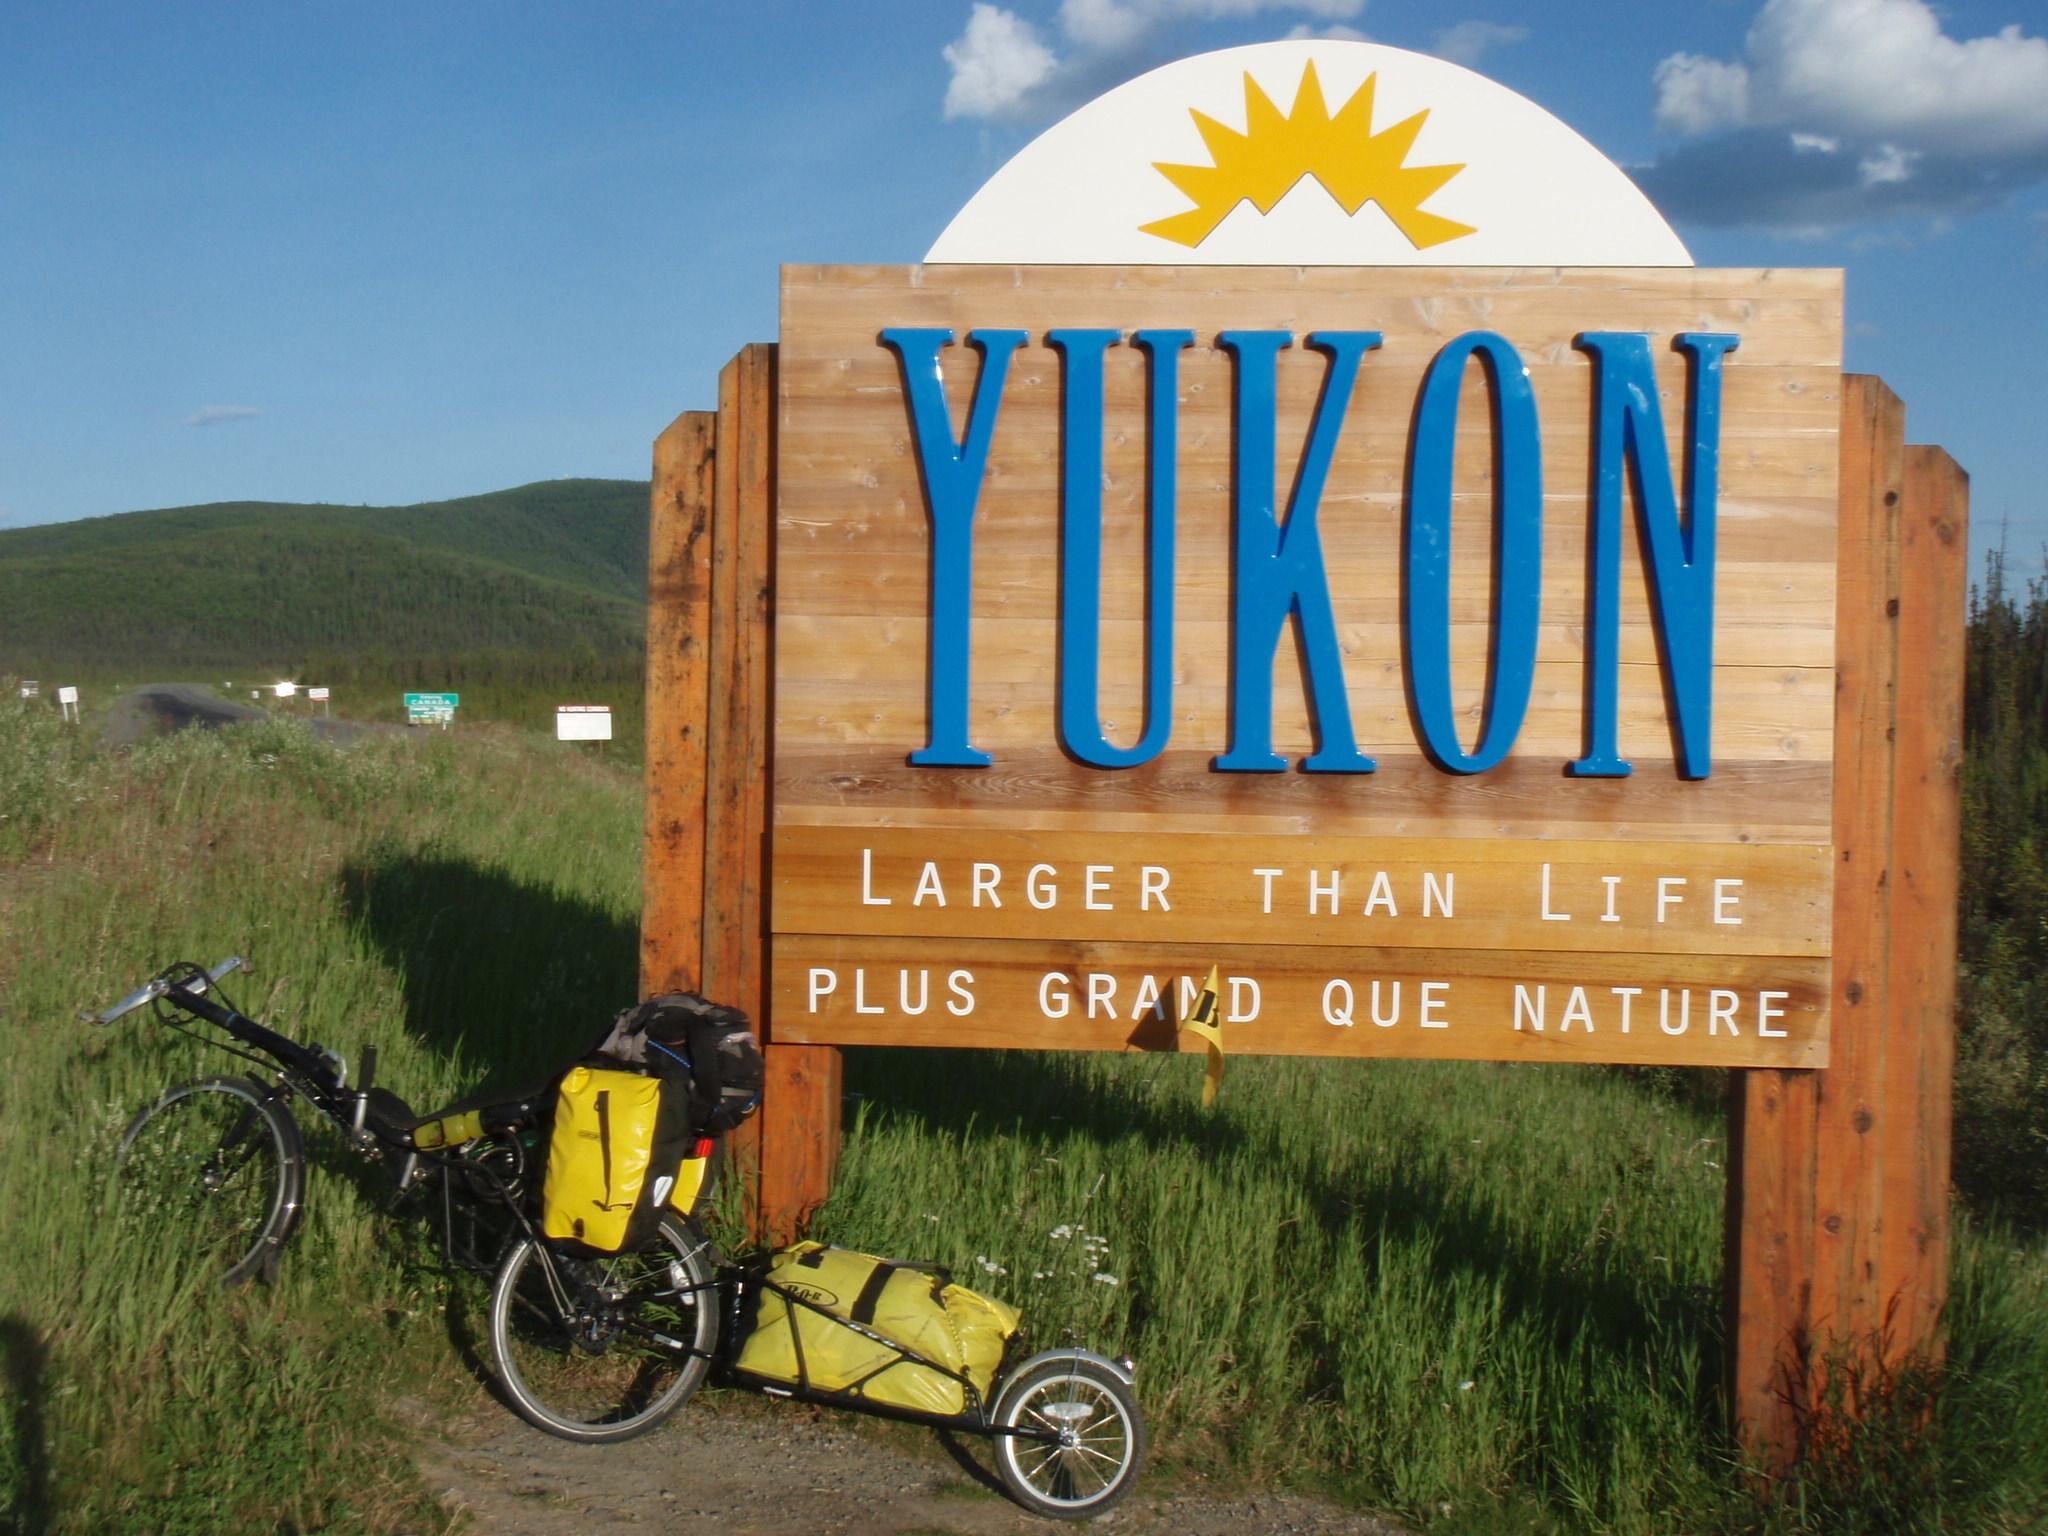 Entering Canada / Yukon Territory coming from Alaska on July 12